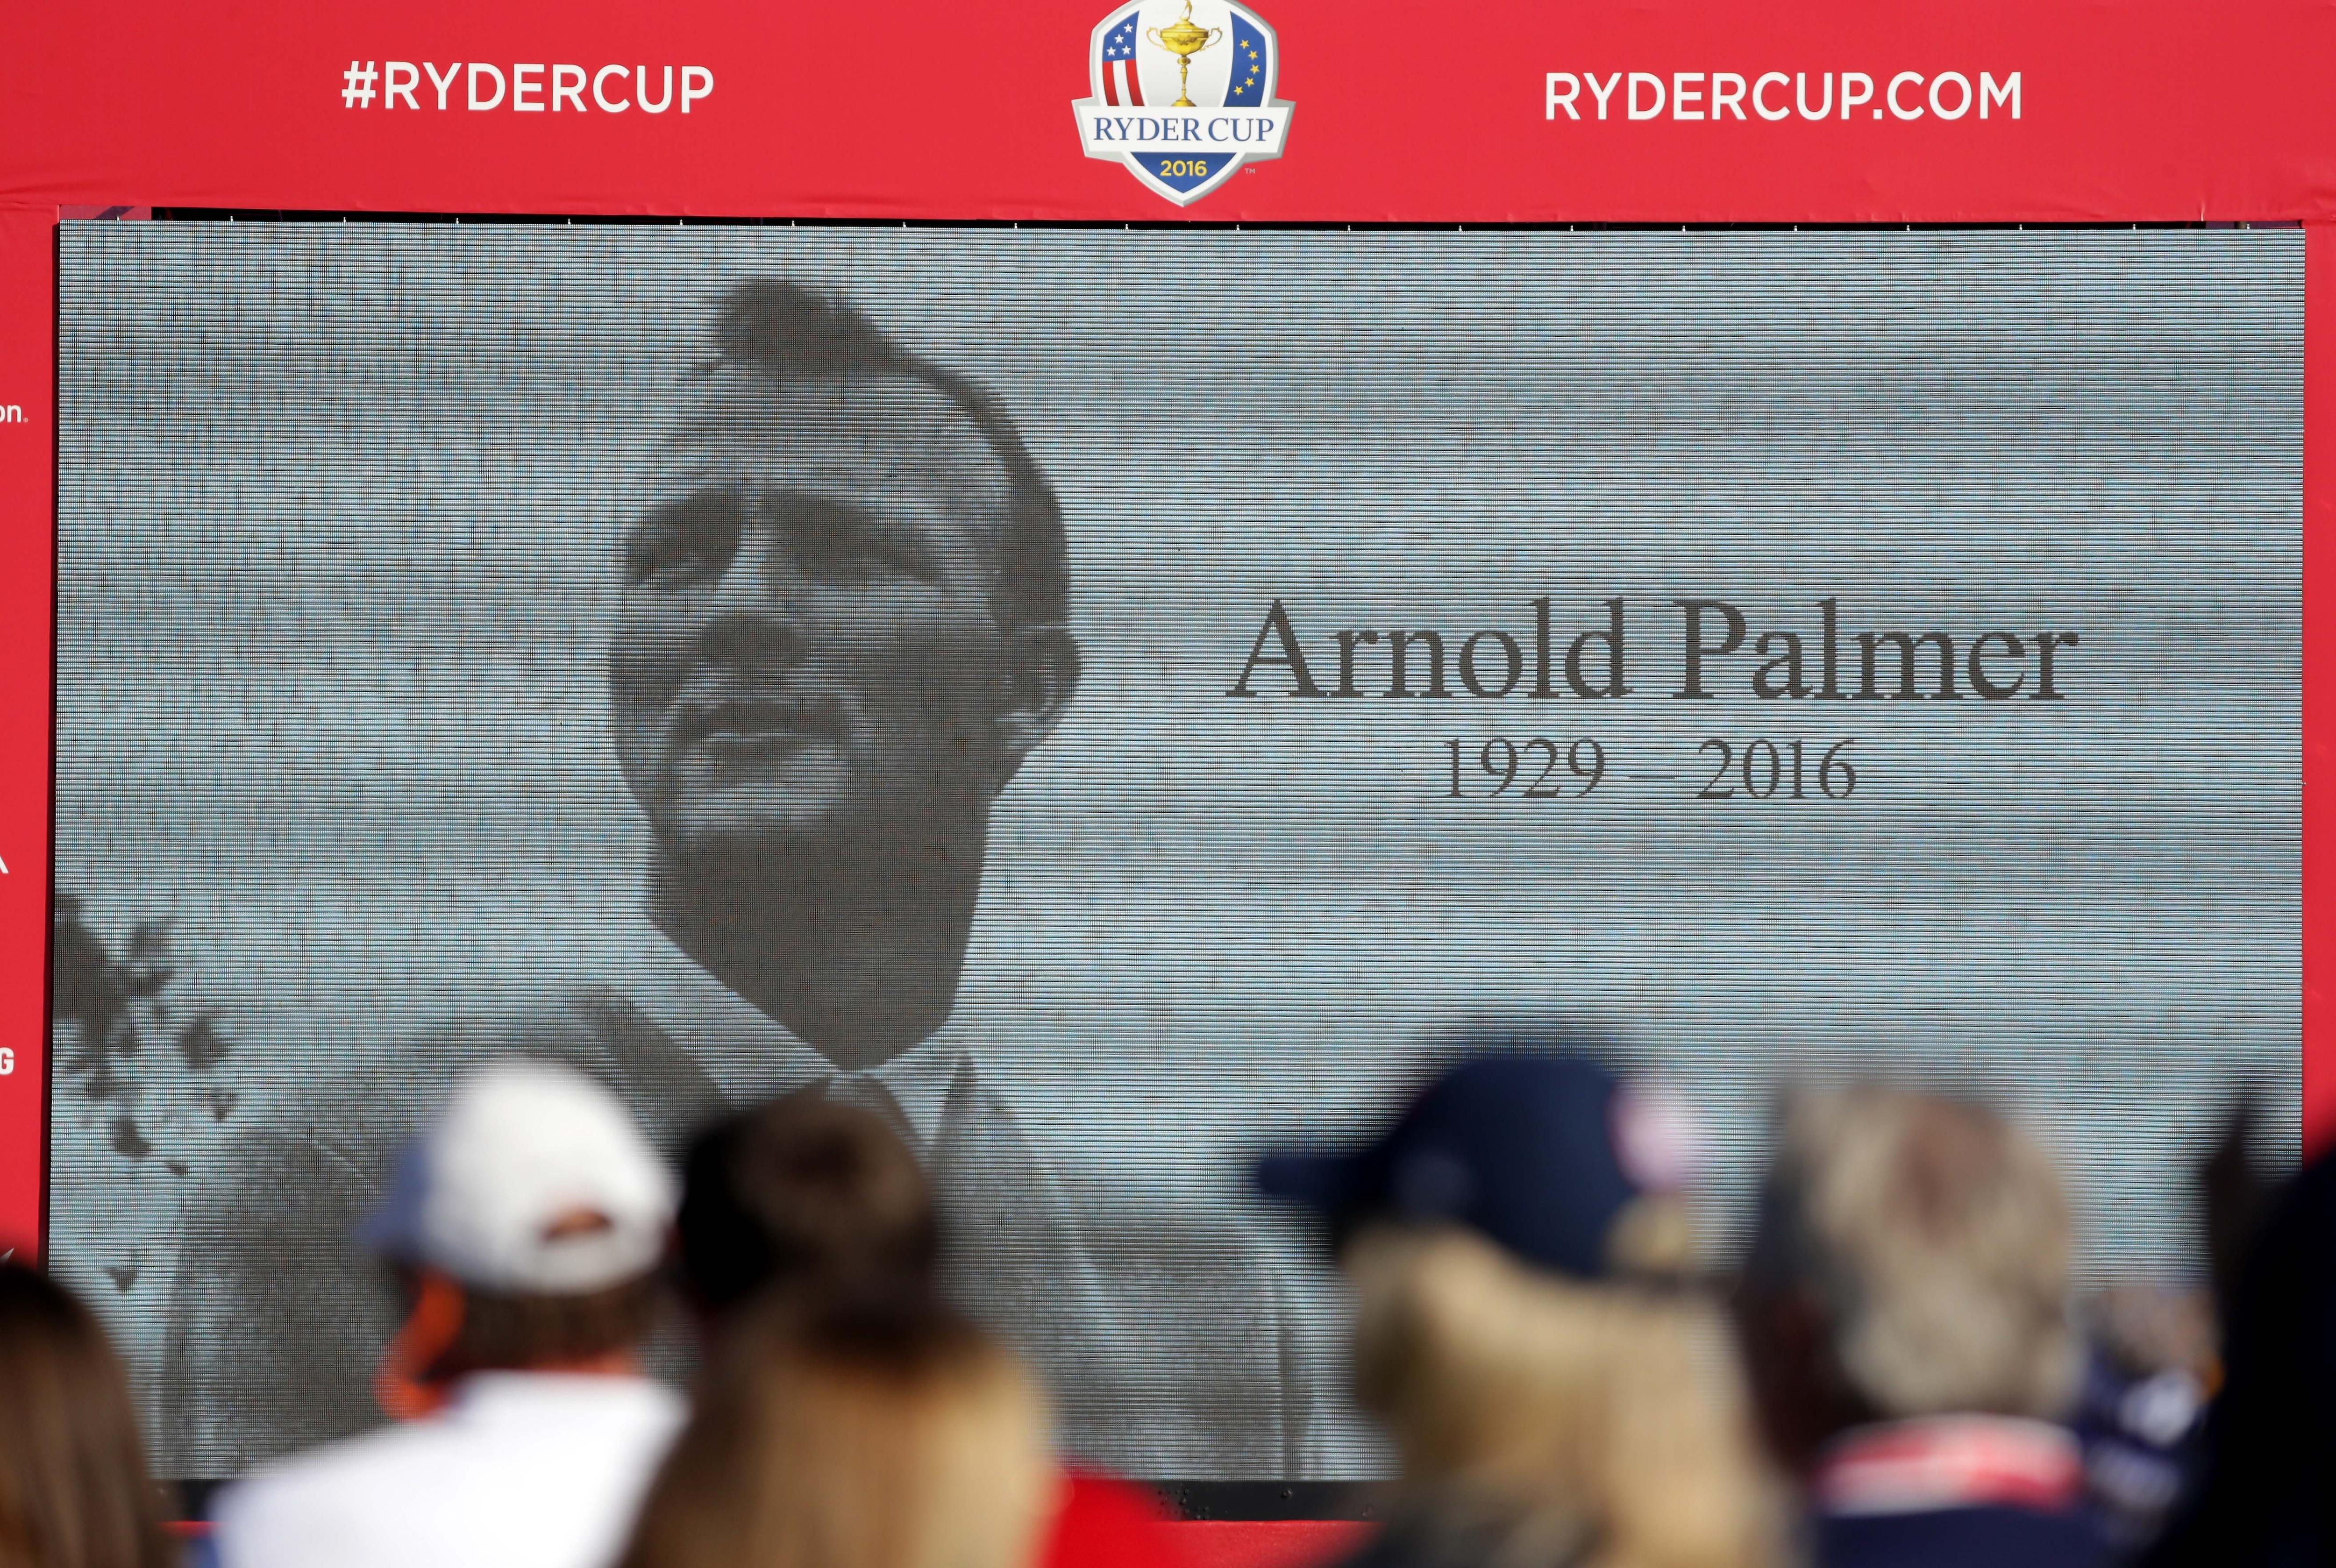 Arnold Palmer video